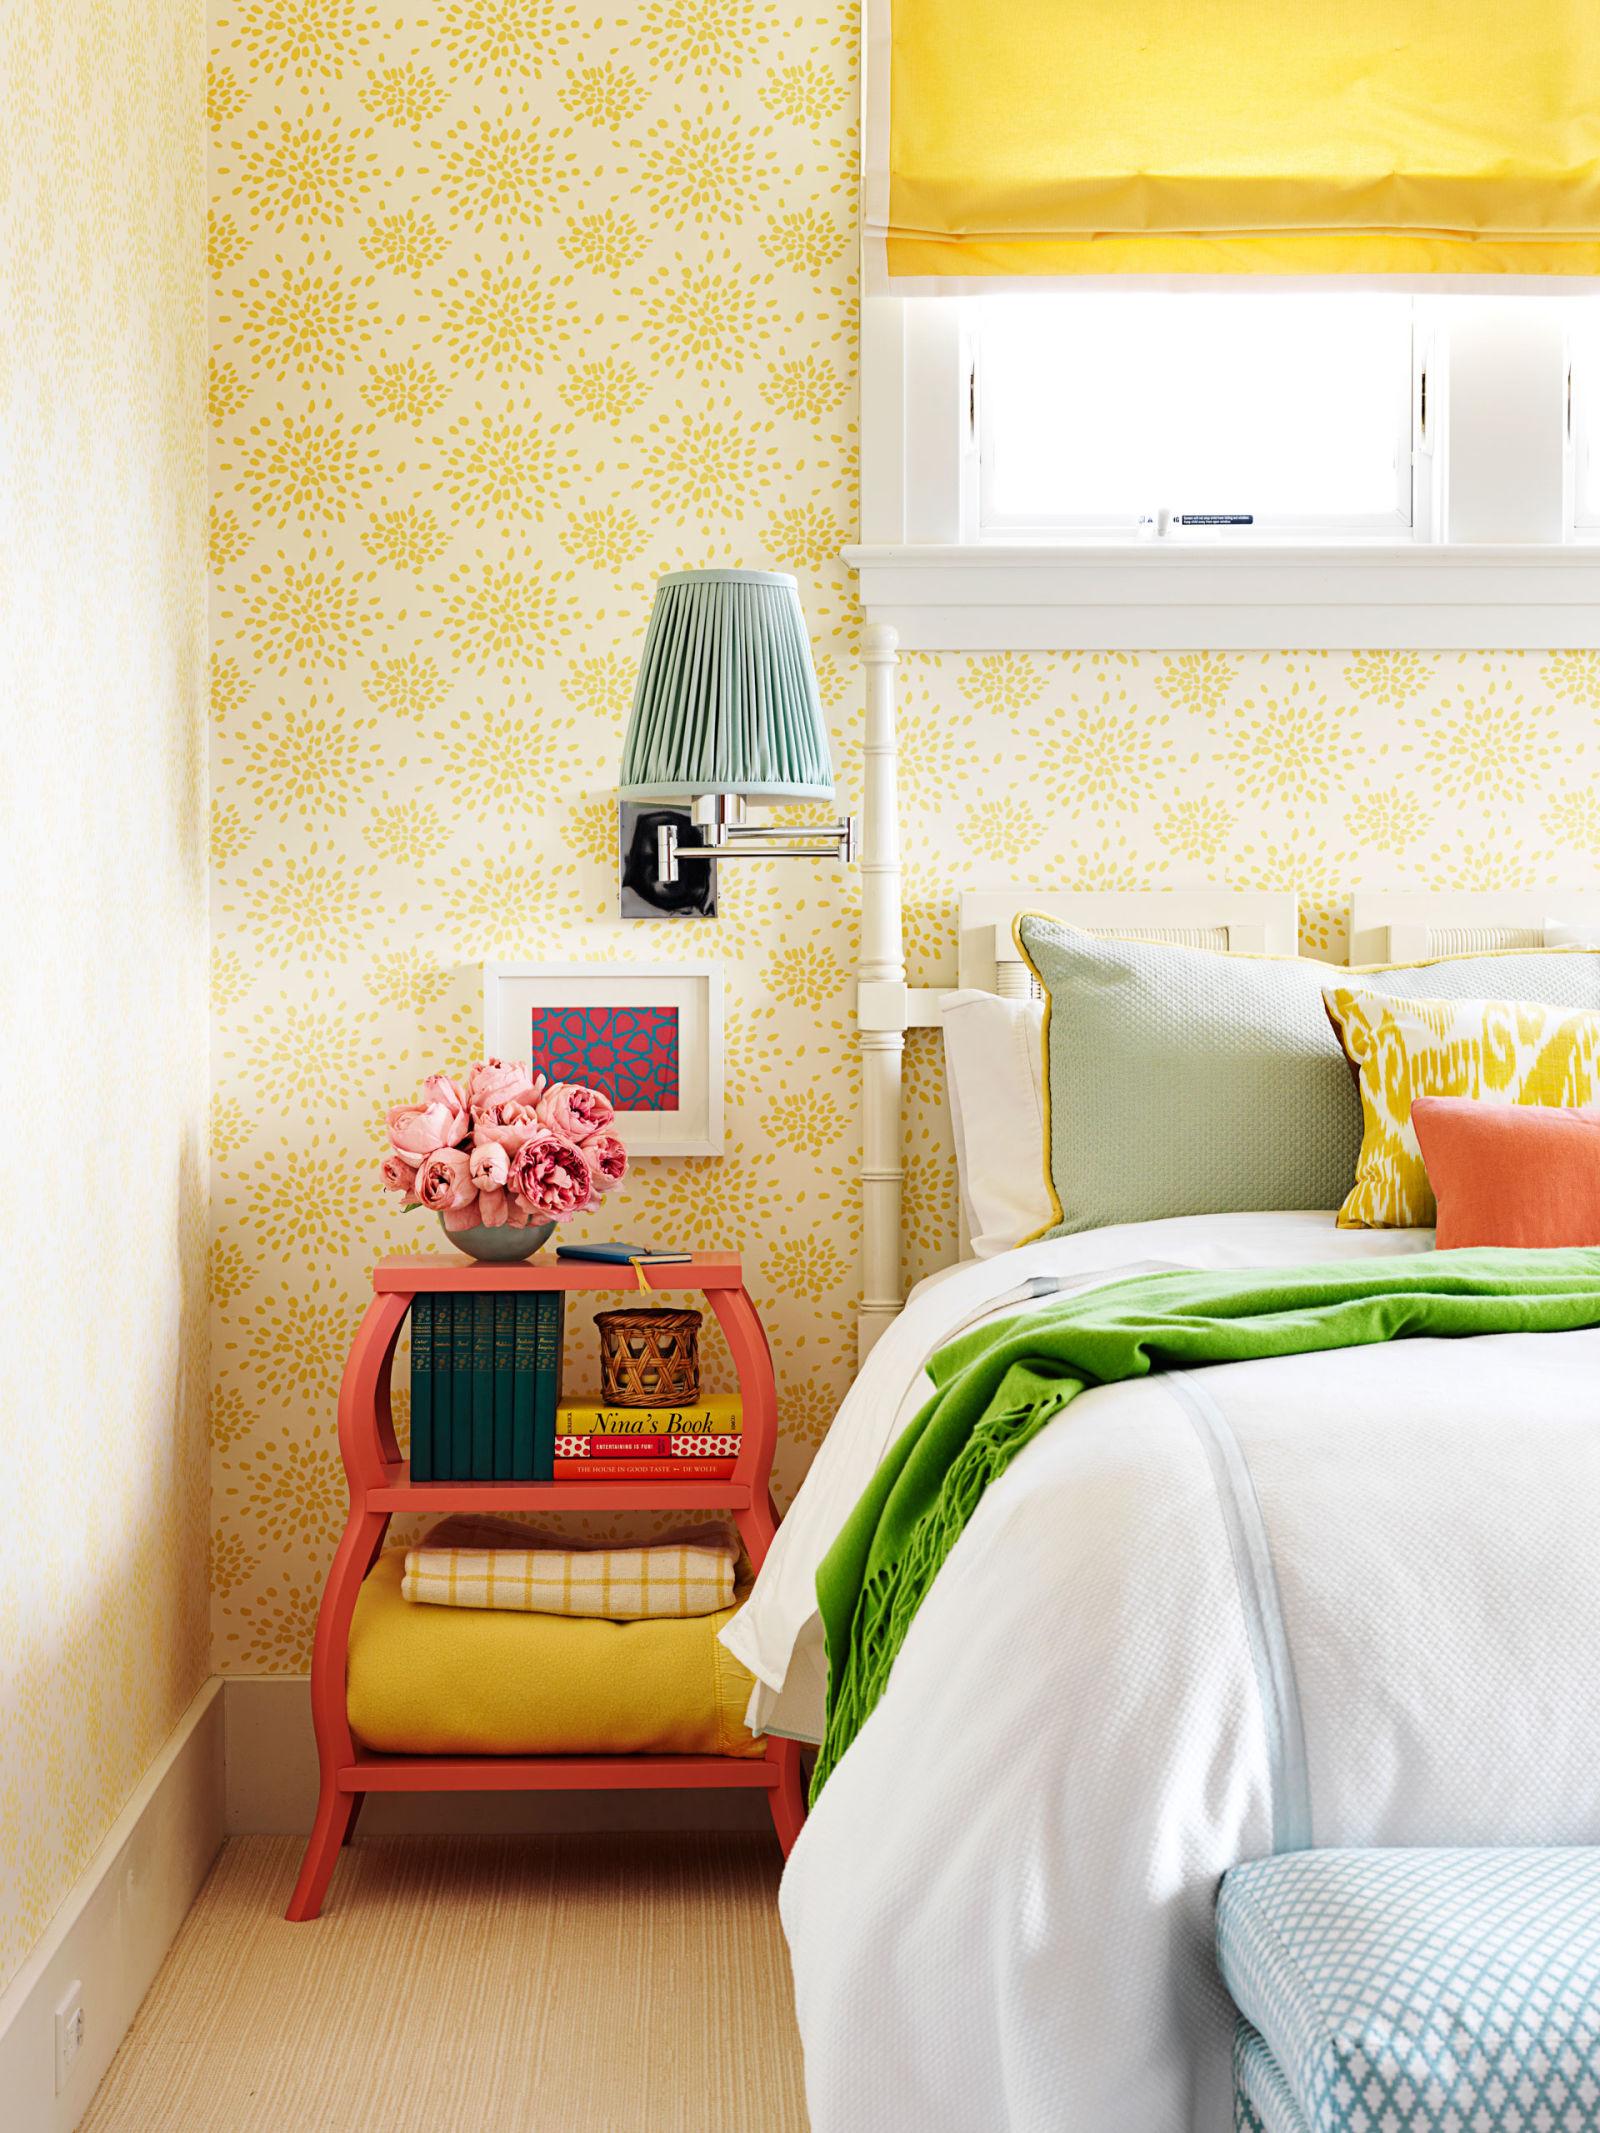 Bedroom Furniture Essentials guest bedroom decor ideas - guest room essentials